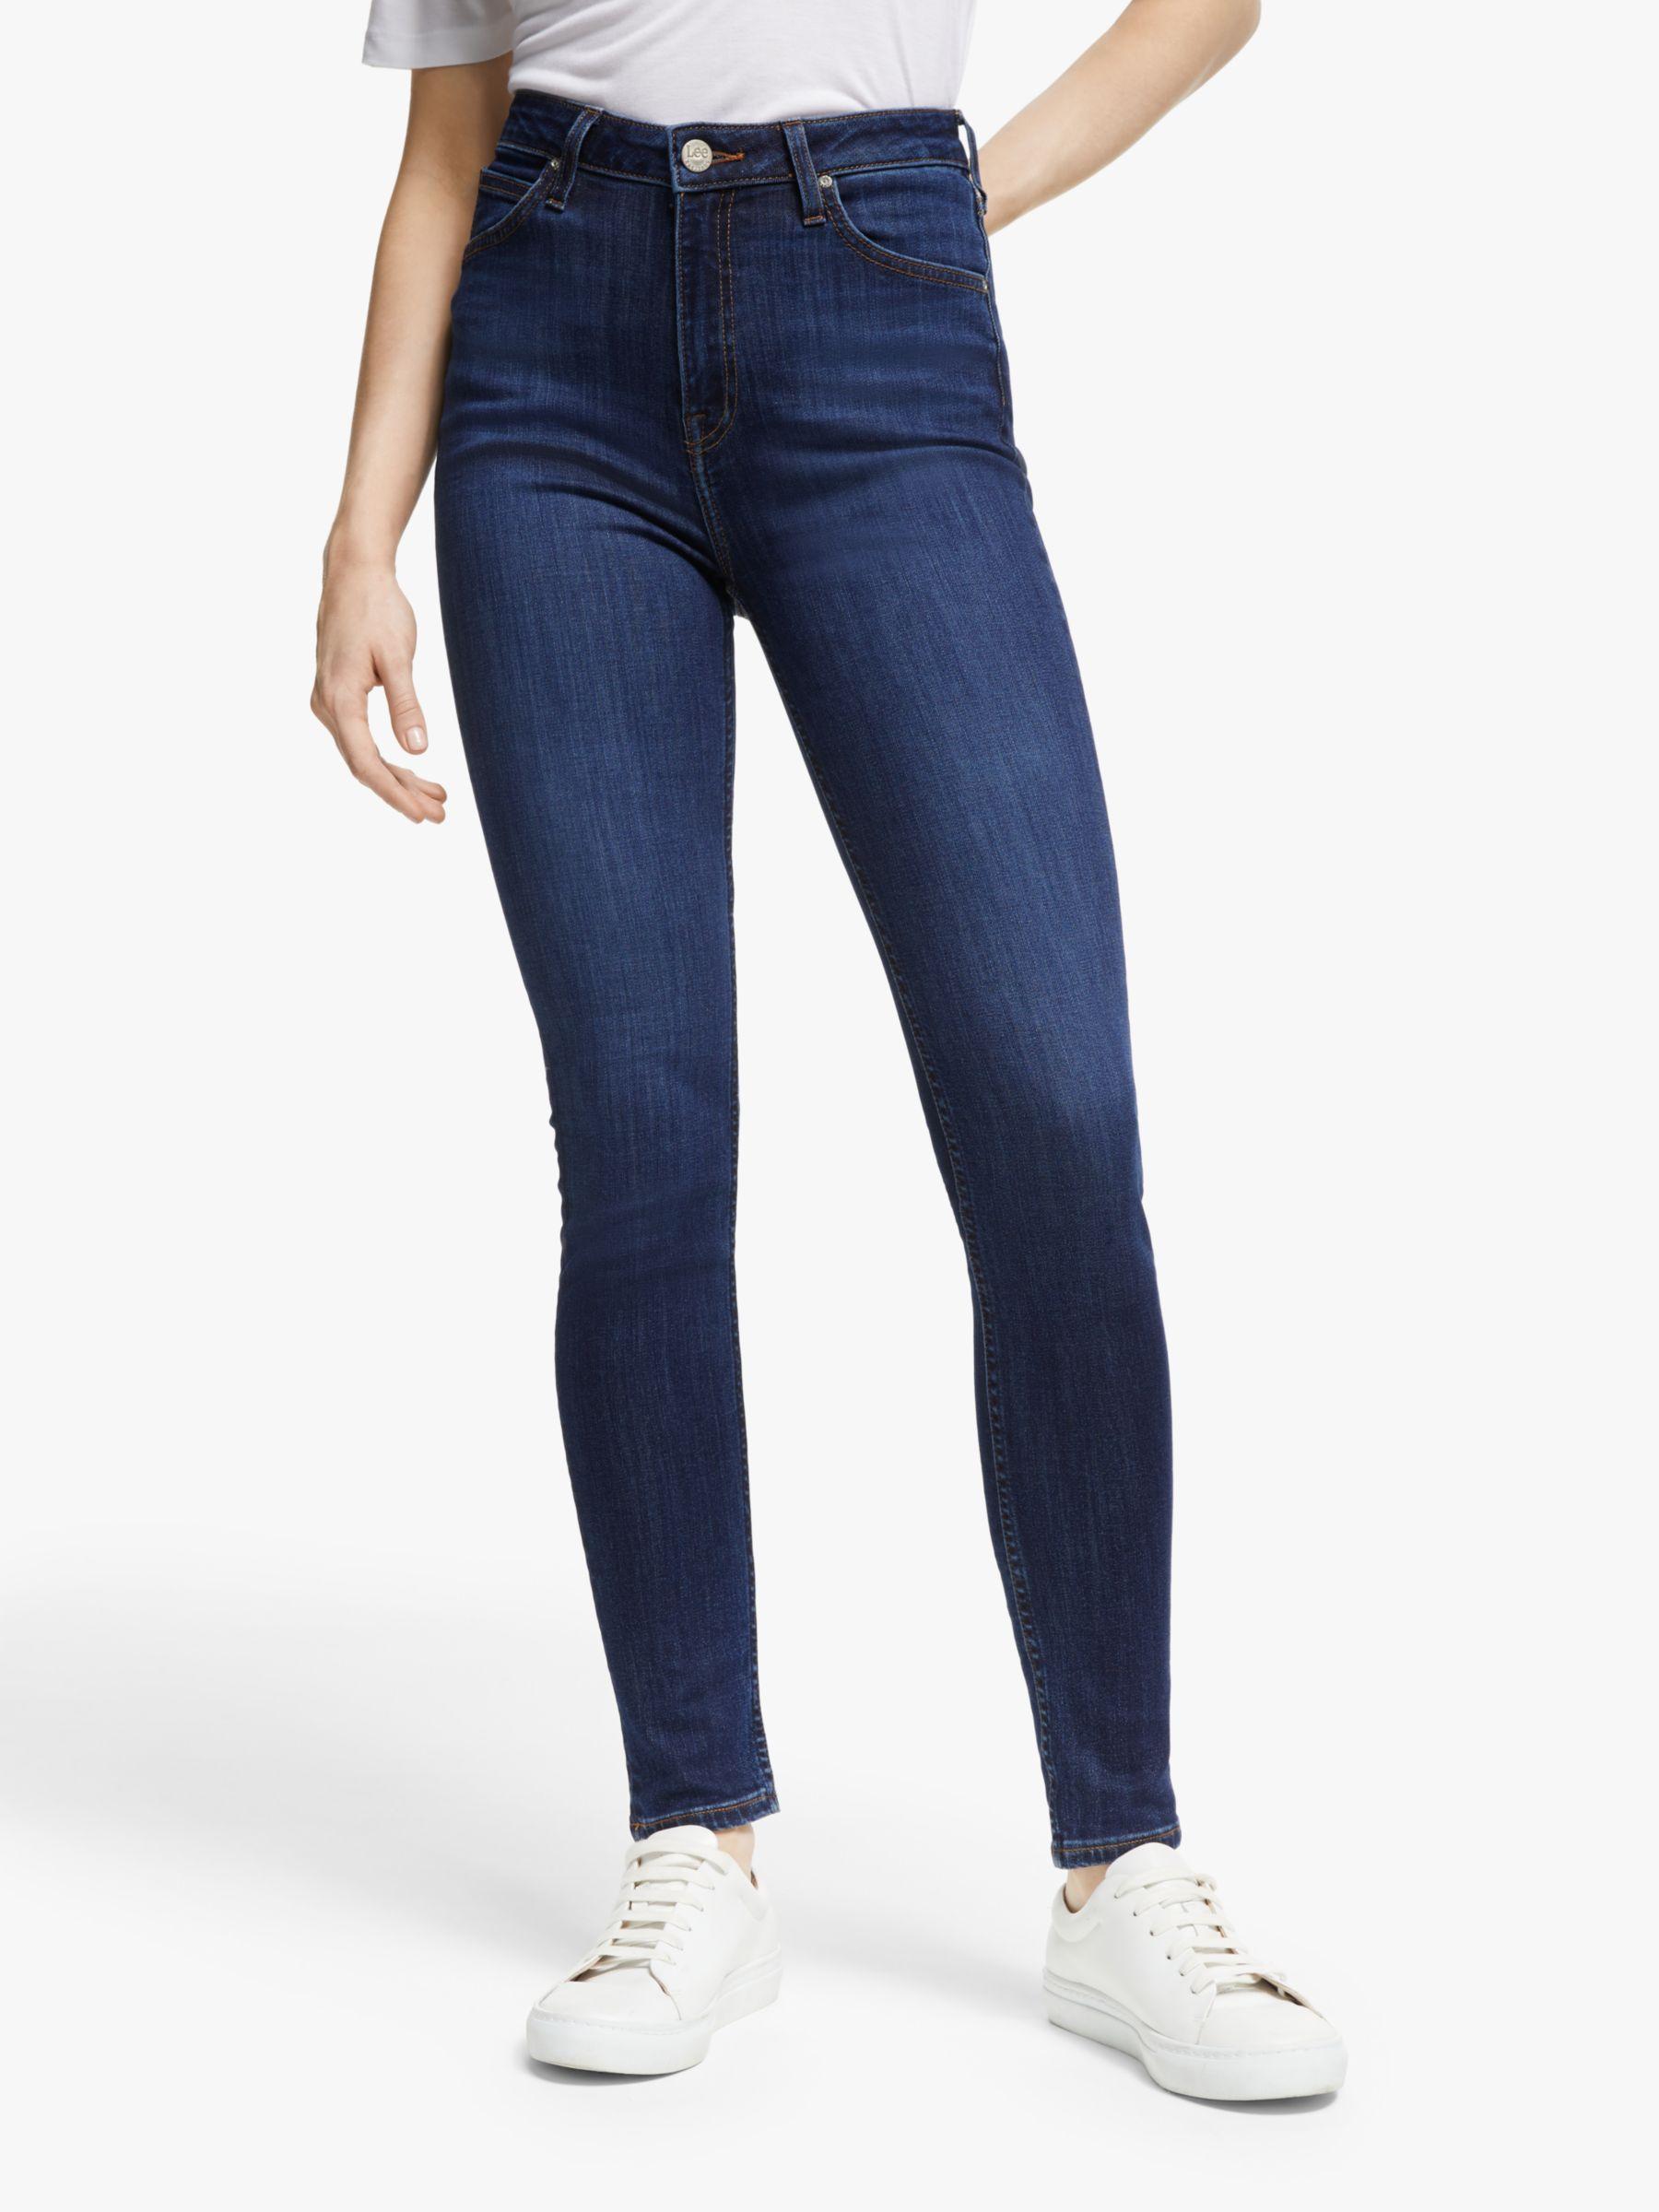 Lee Lee Ivy High Waist Super Skinny Jeans, Dark Hunt